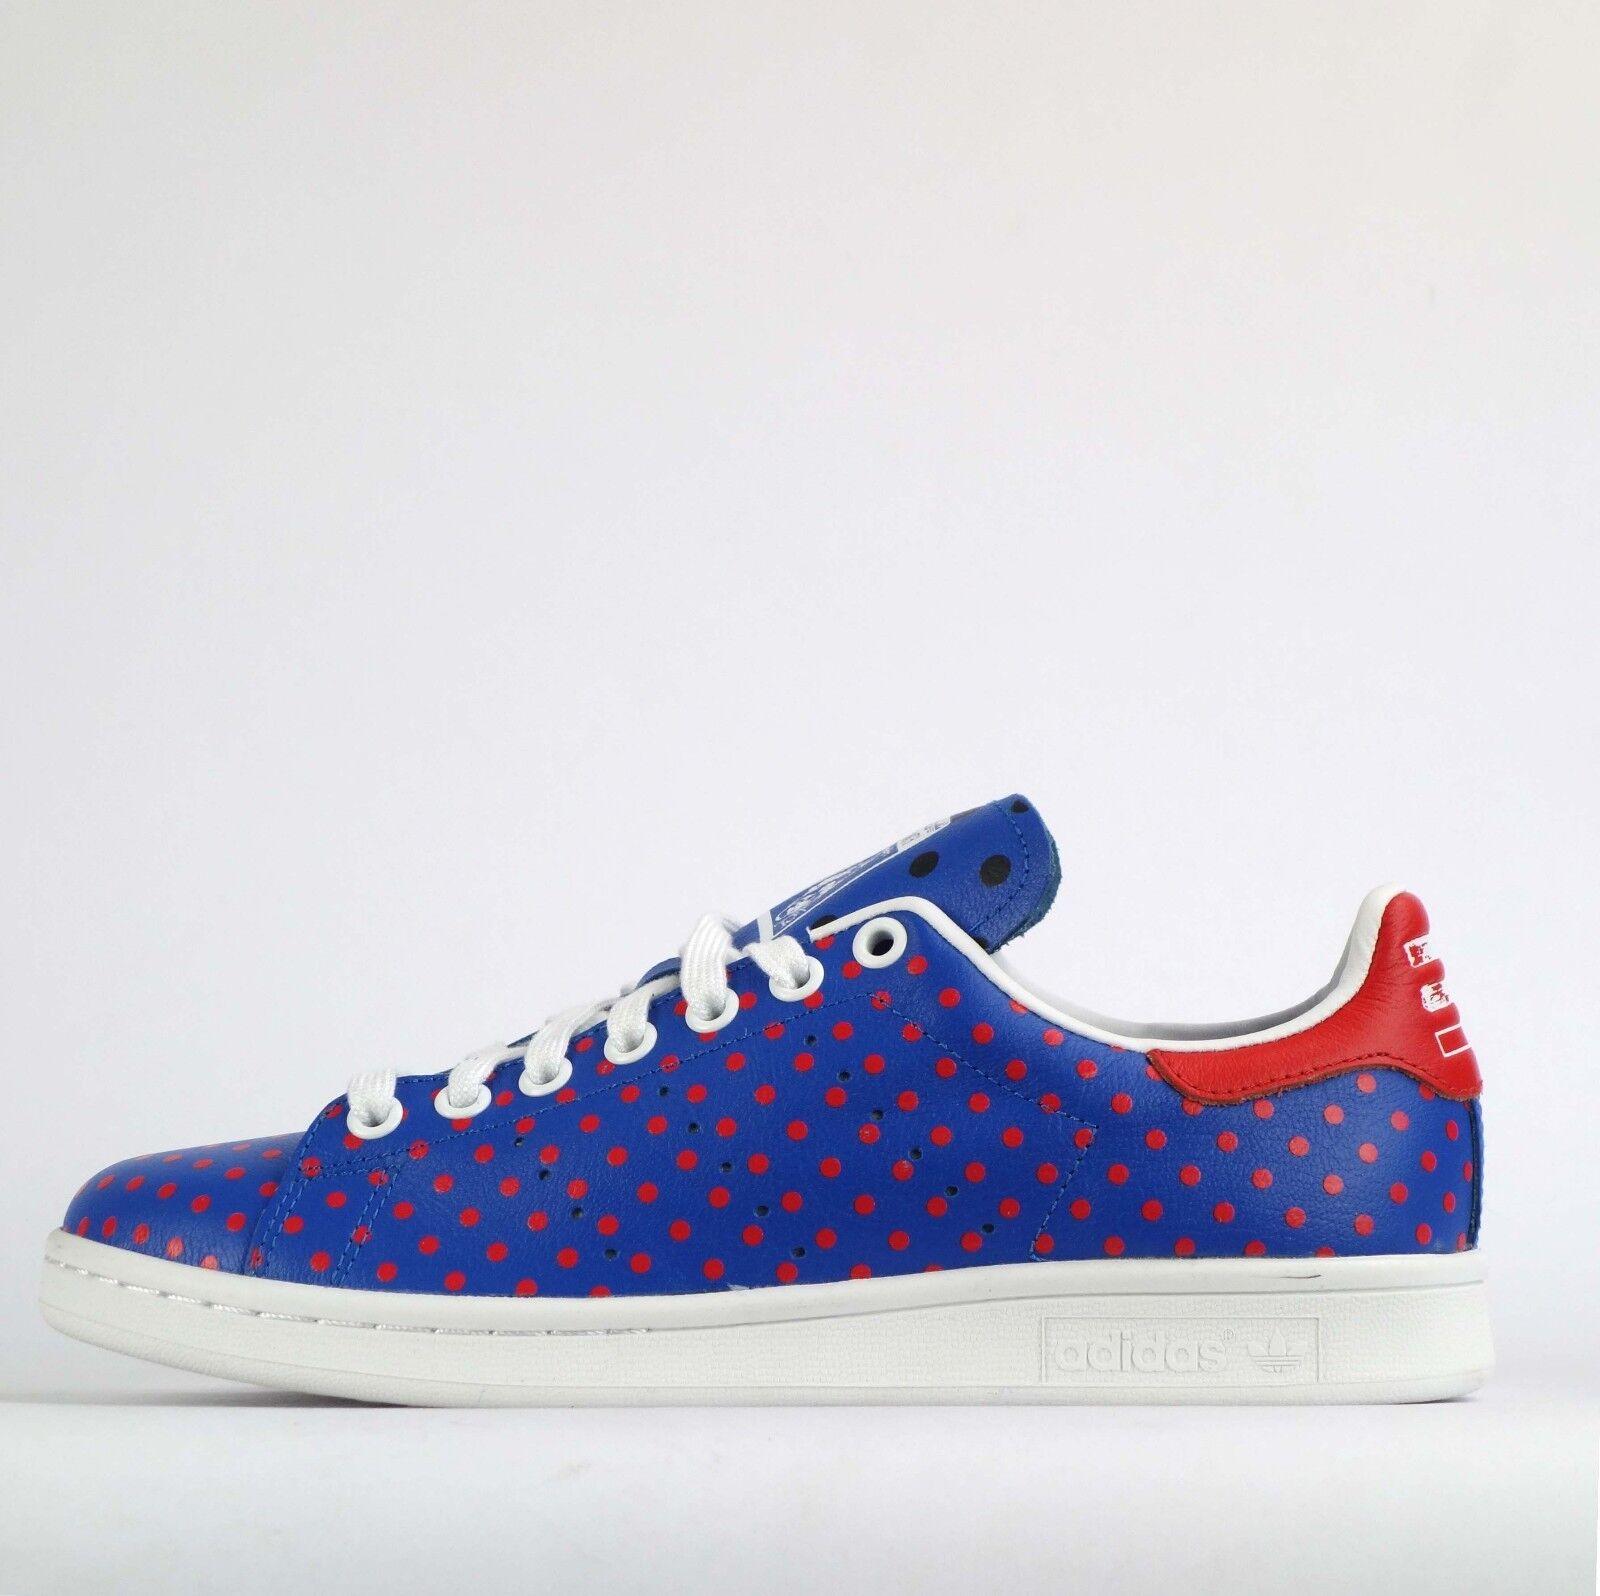 adidas Originals Stan Smith Pharrell Williams SPD Herren Freizeit Schuhe blau